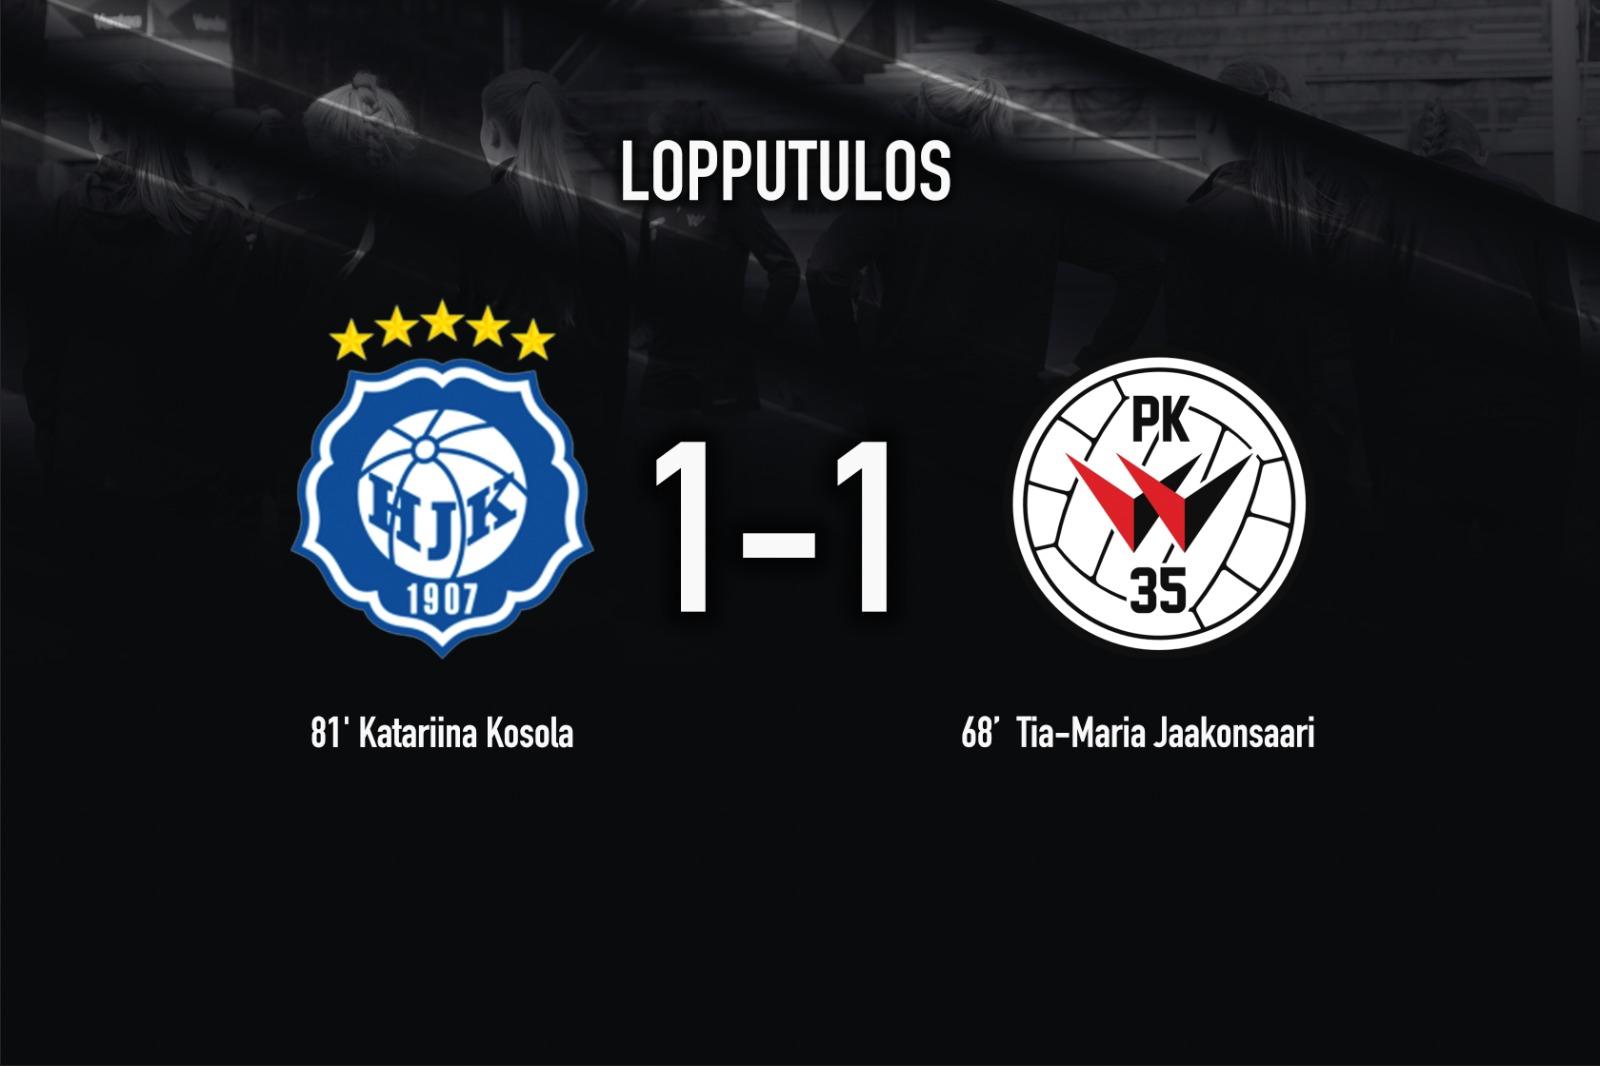 HJK – PK 35 Vantaa 1 1 7.5.2021